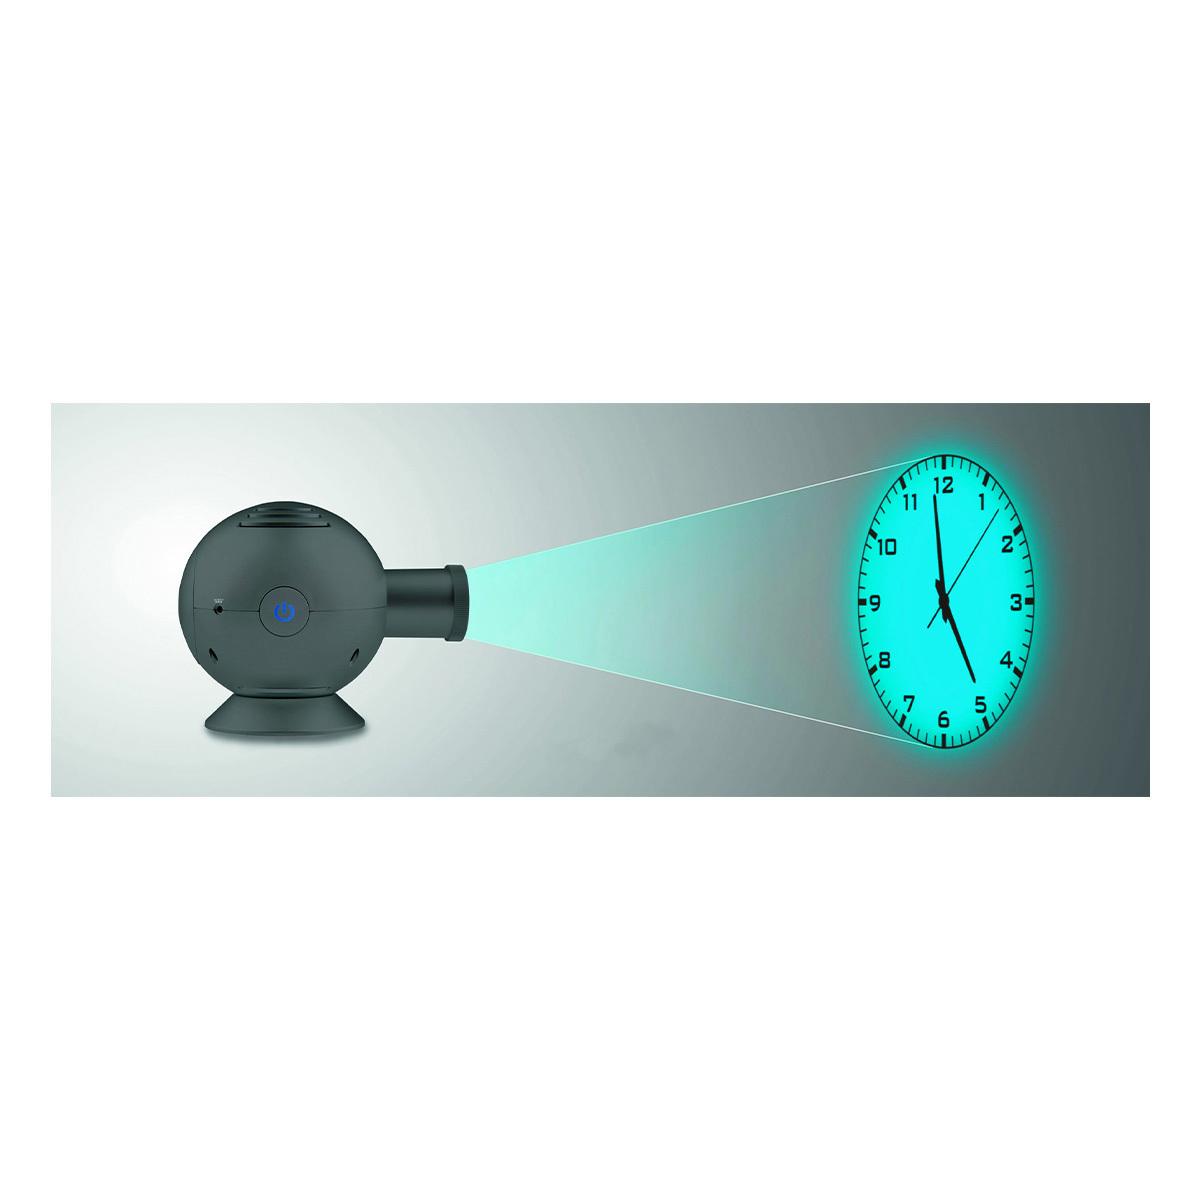 60-5007-analoge-projektionsuhr-time-ball-blau-1200x1200px.jpg